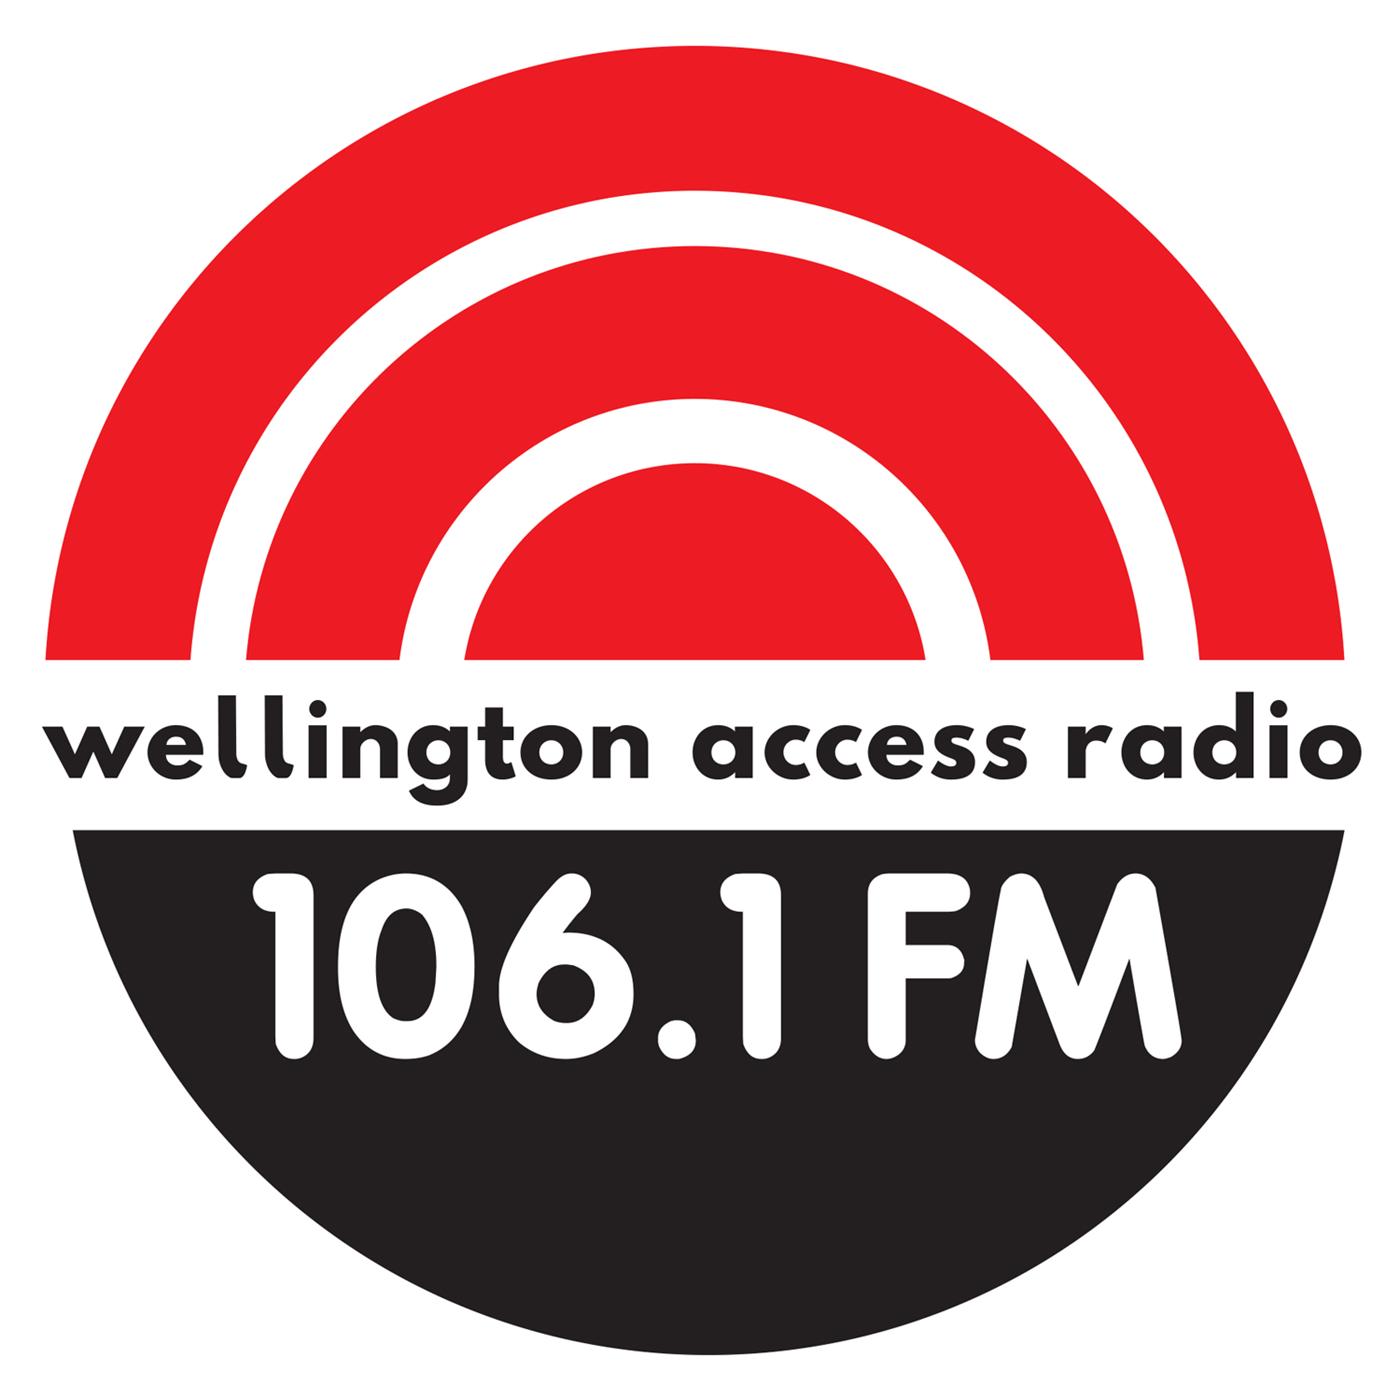 https://cdn.accessradio.org/StationFolder/war/Images/Te_Atua_Umereia.png